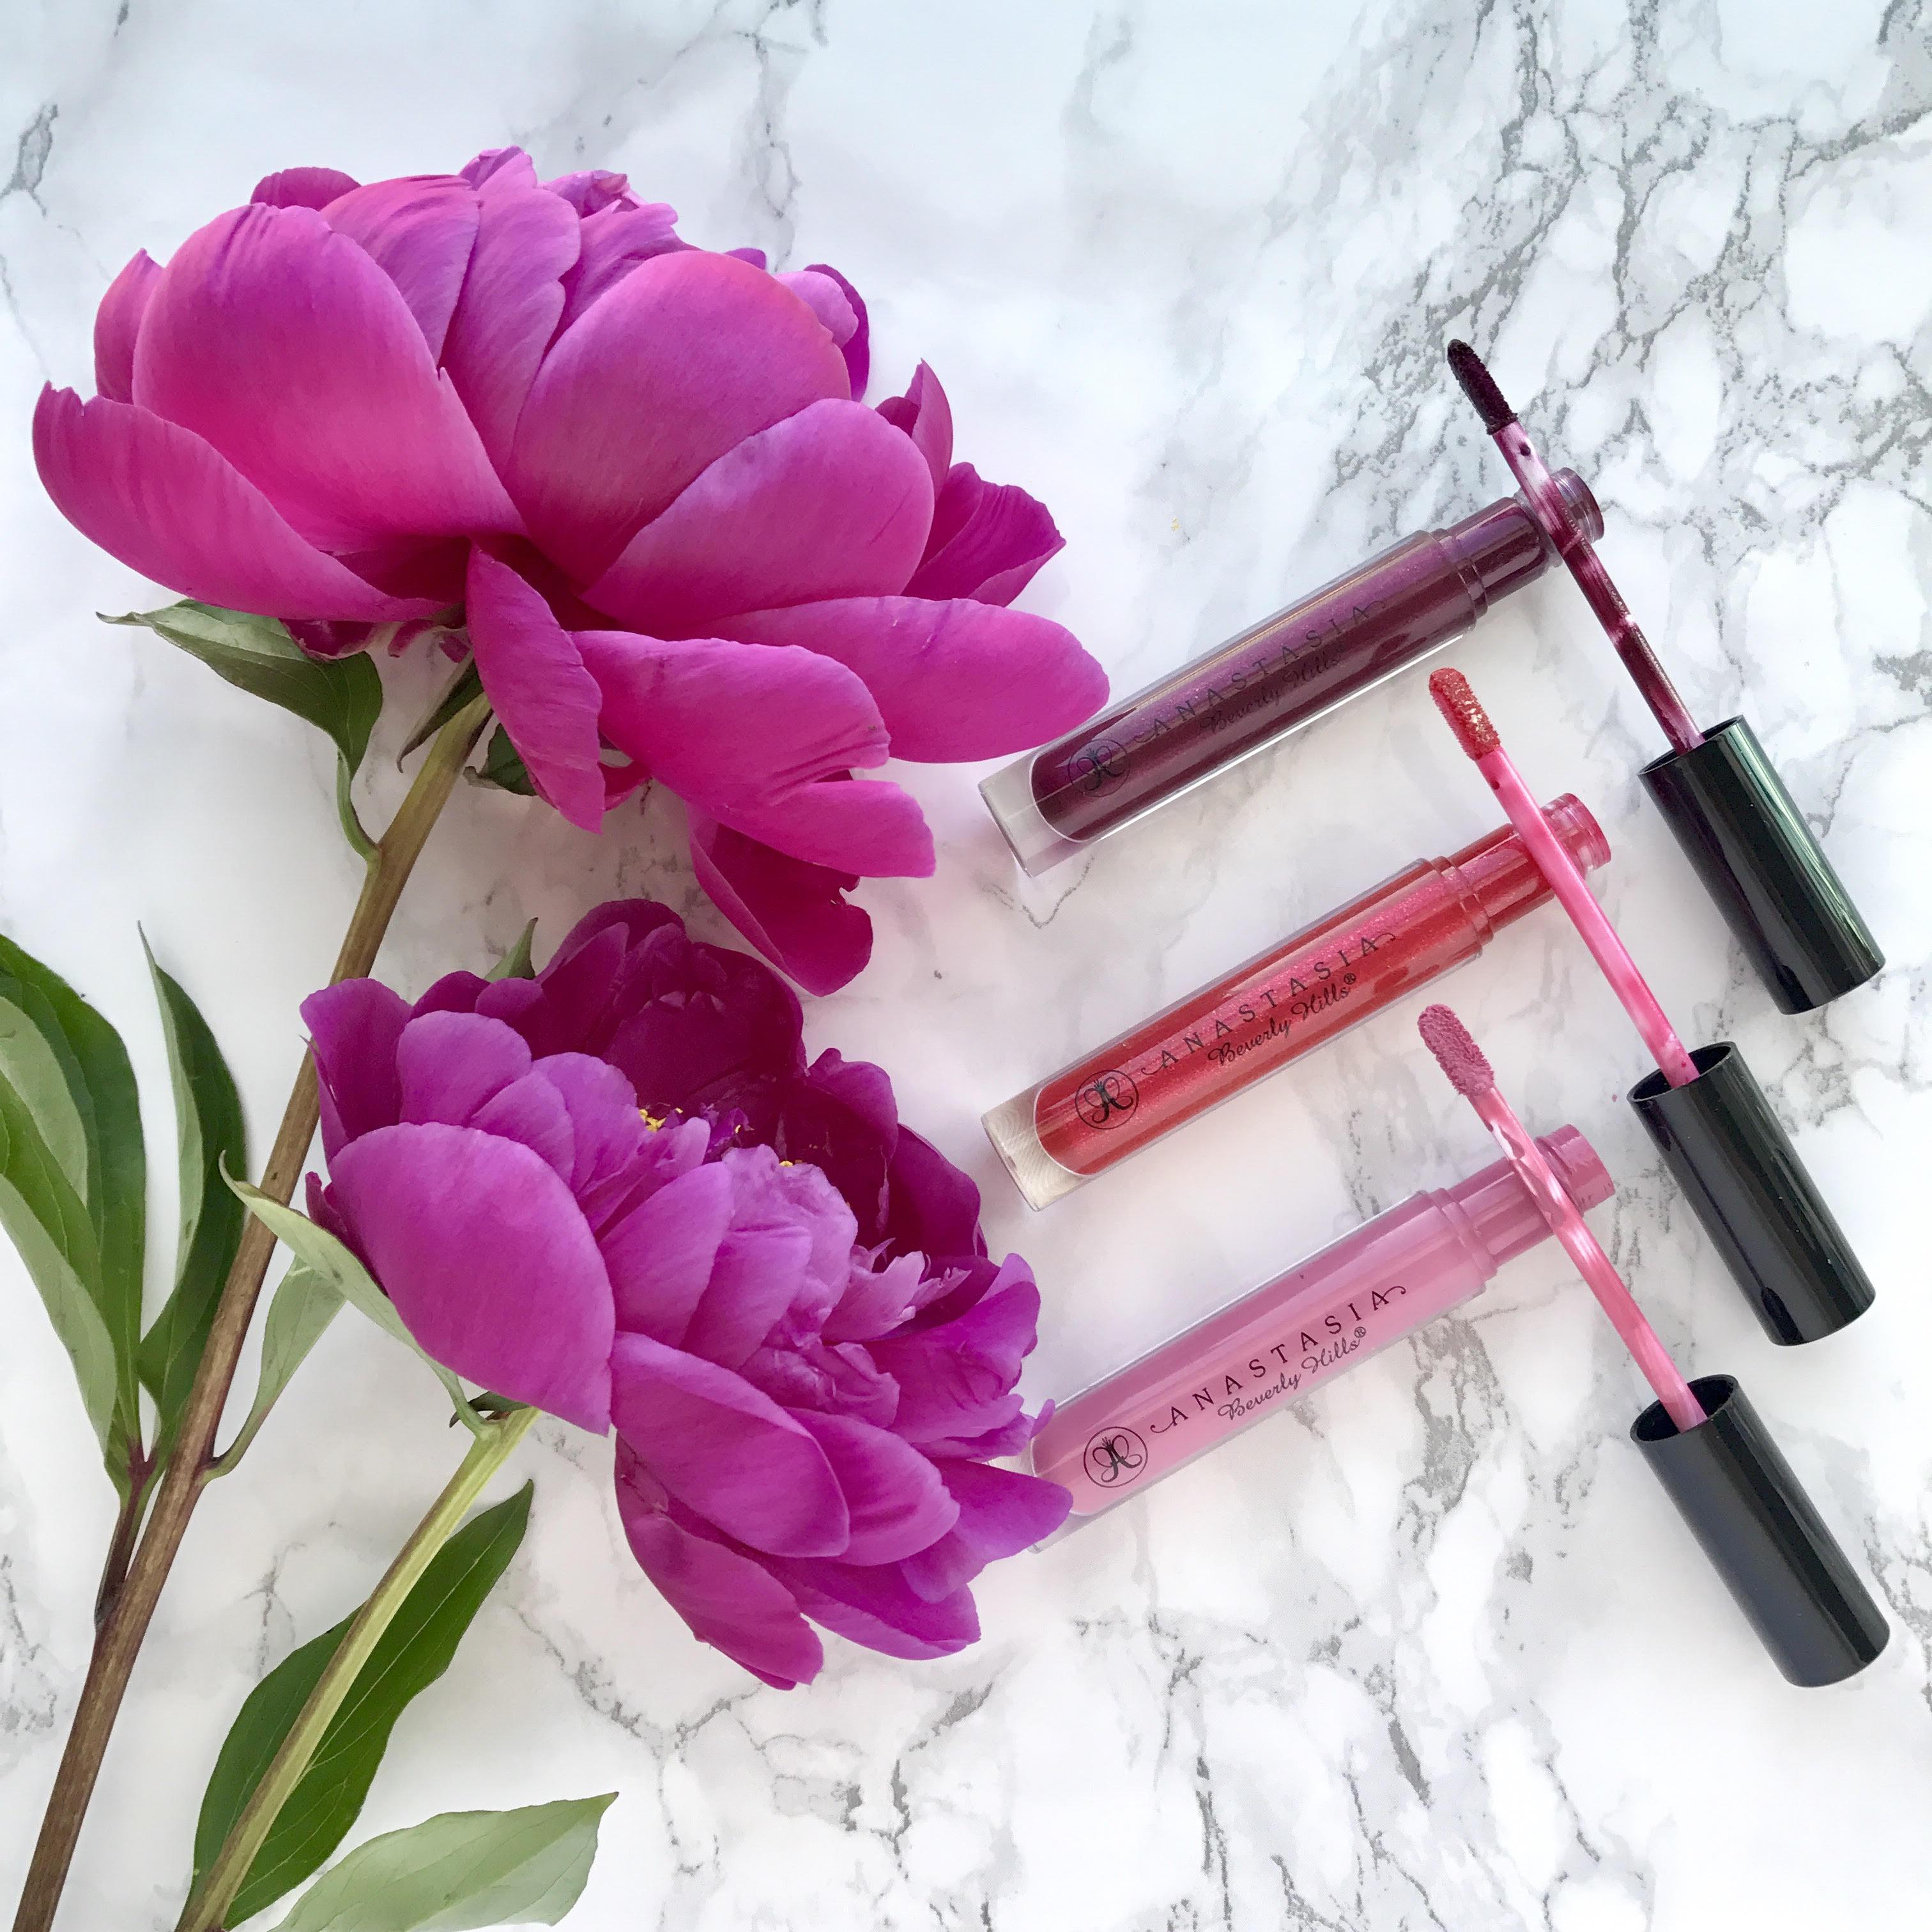 Product Review: Anastasia Beverly Hills Lip Gloss | She Sweats Diamonds